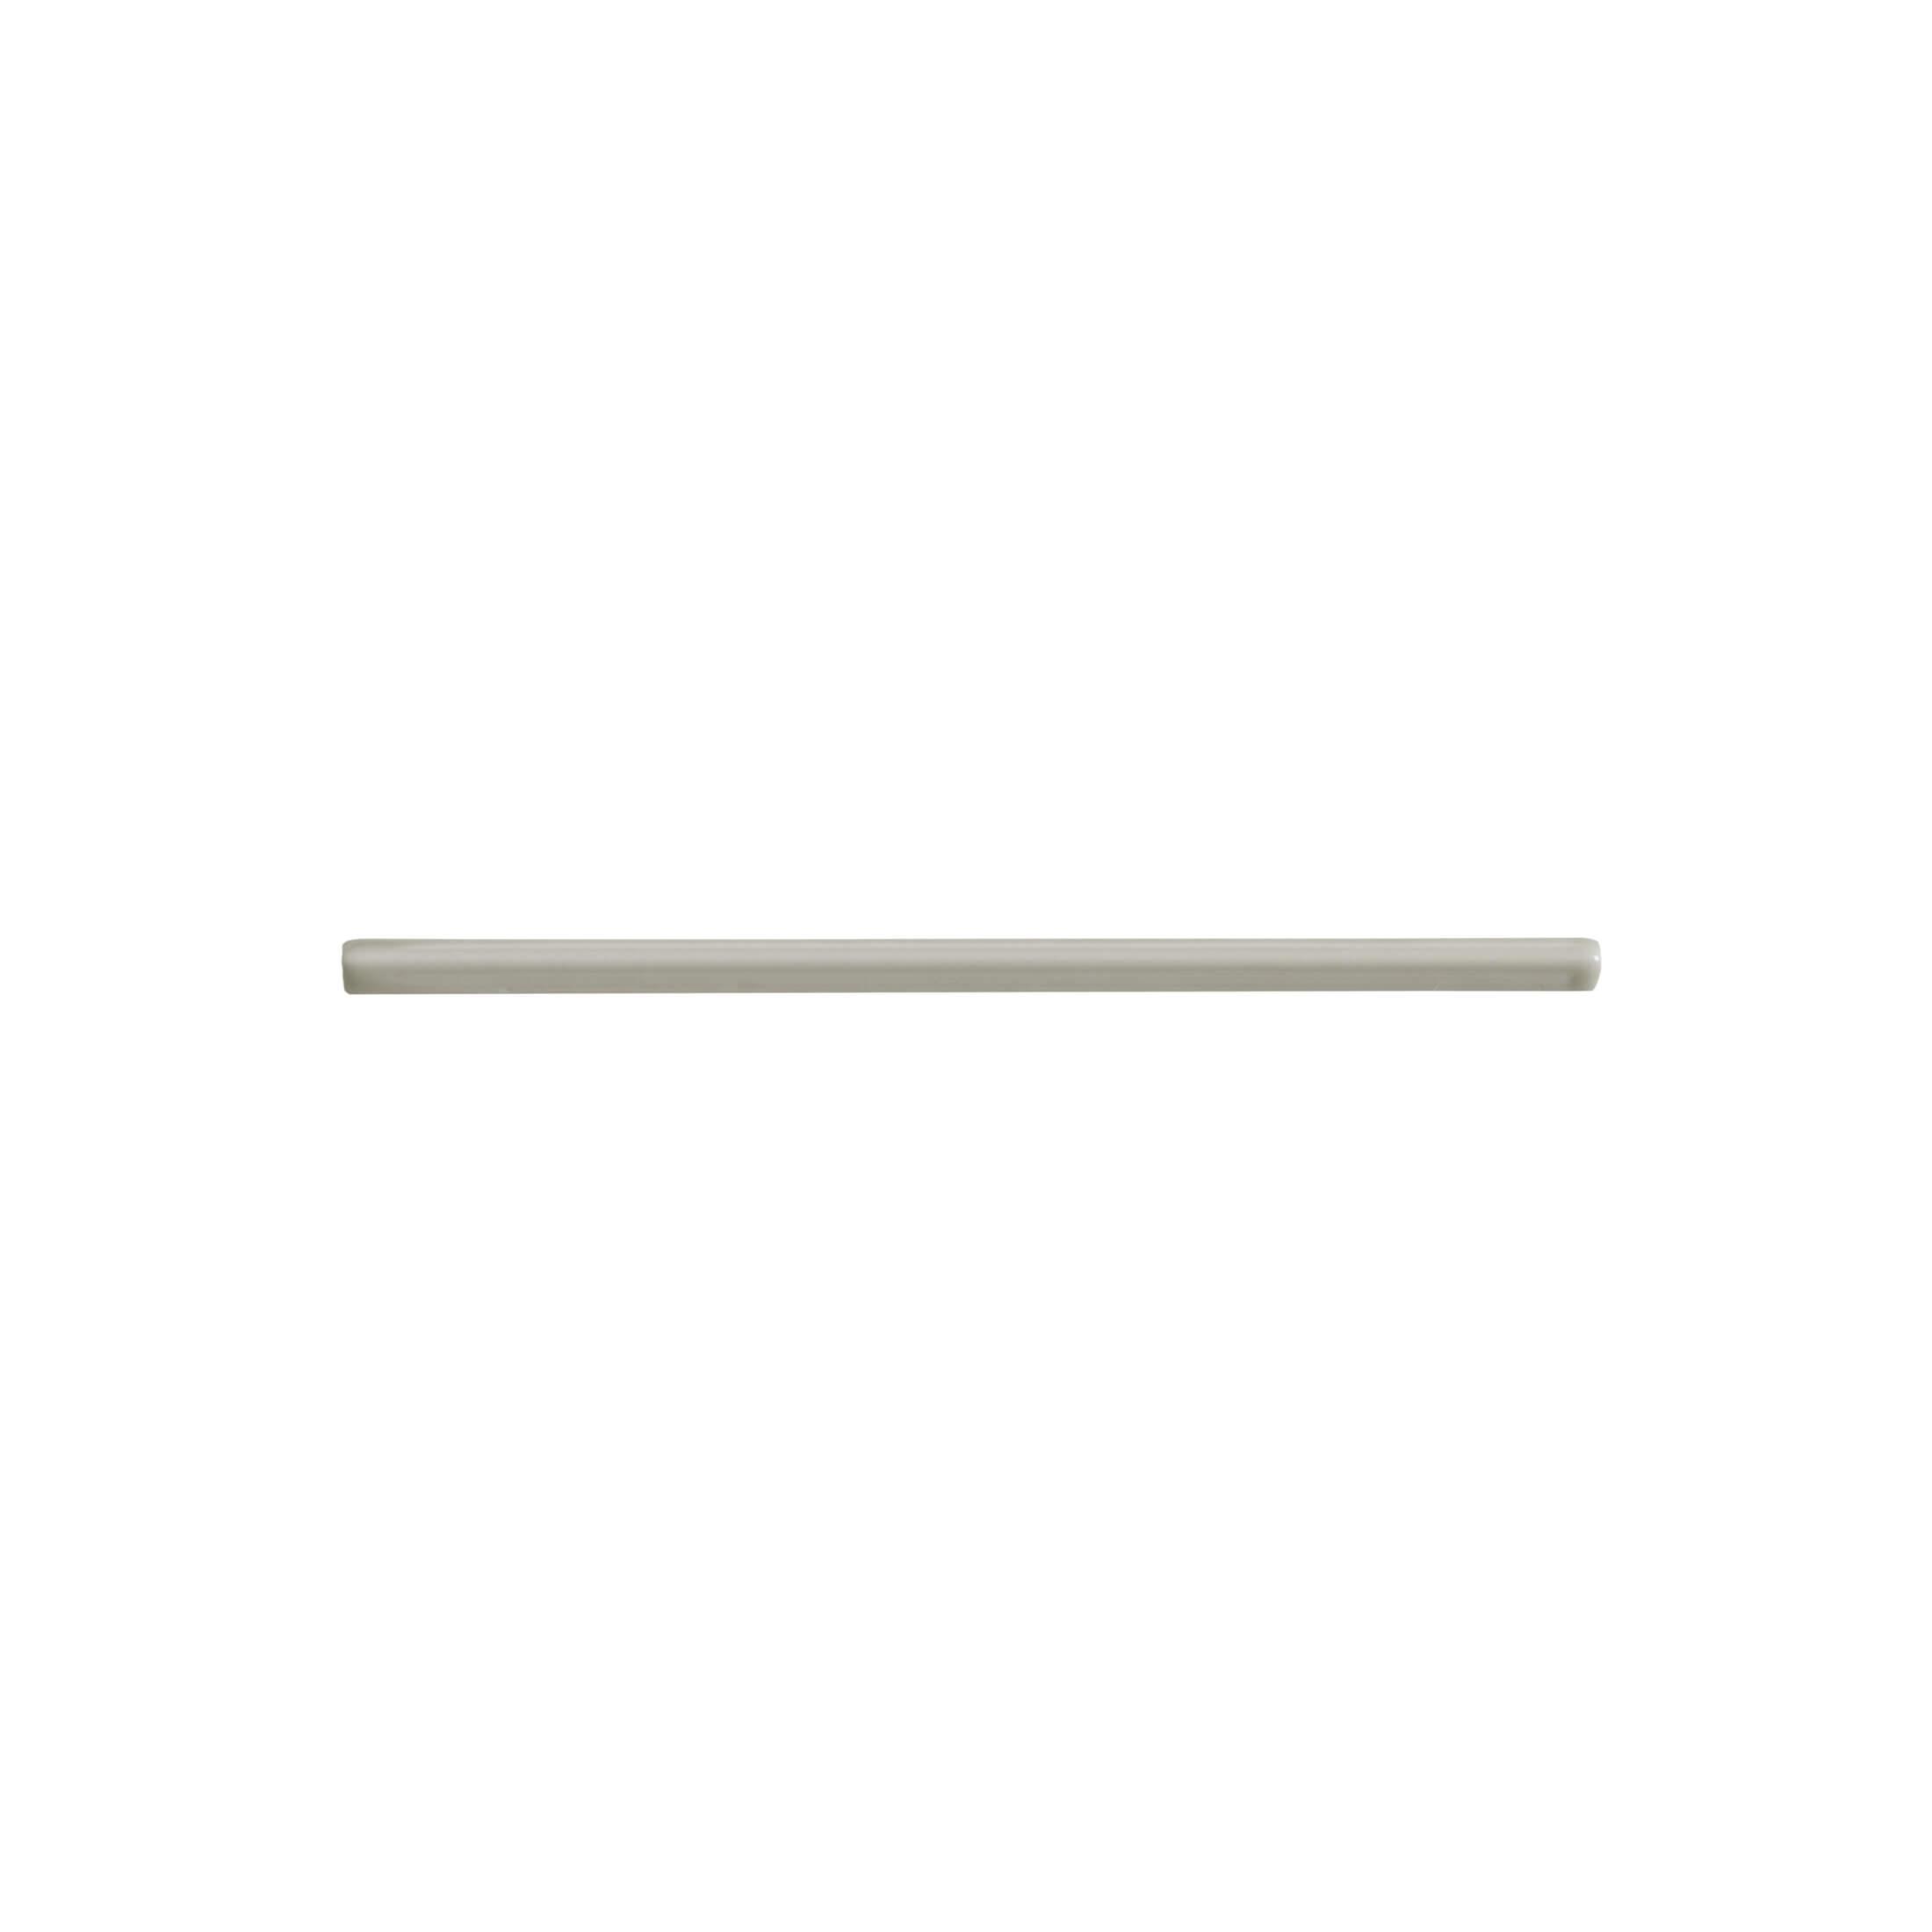 ADNE5586 - BULLNOSE TRIM - 0.85 cm X 20 cm